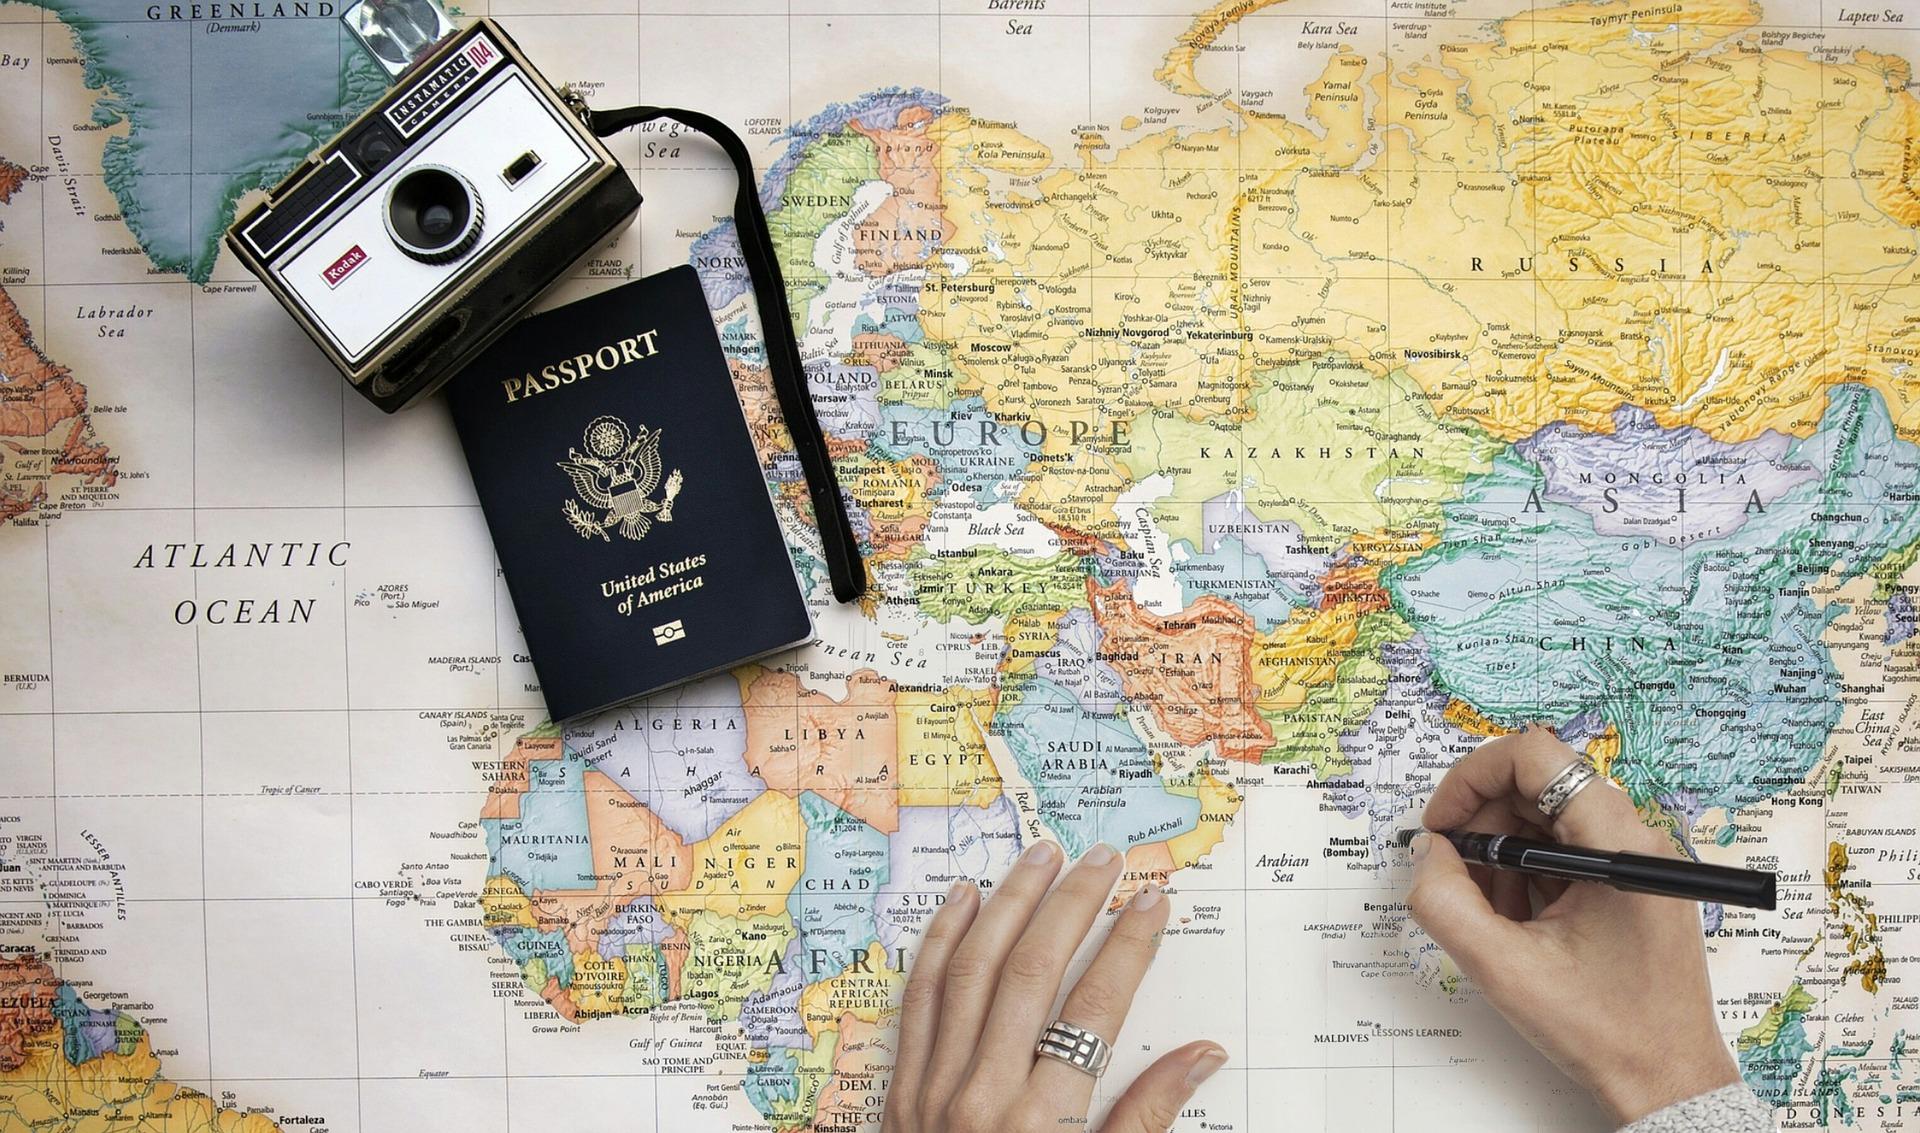 Virginia Identification Needed for Travel